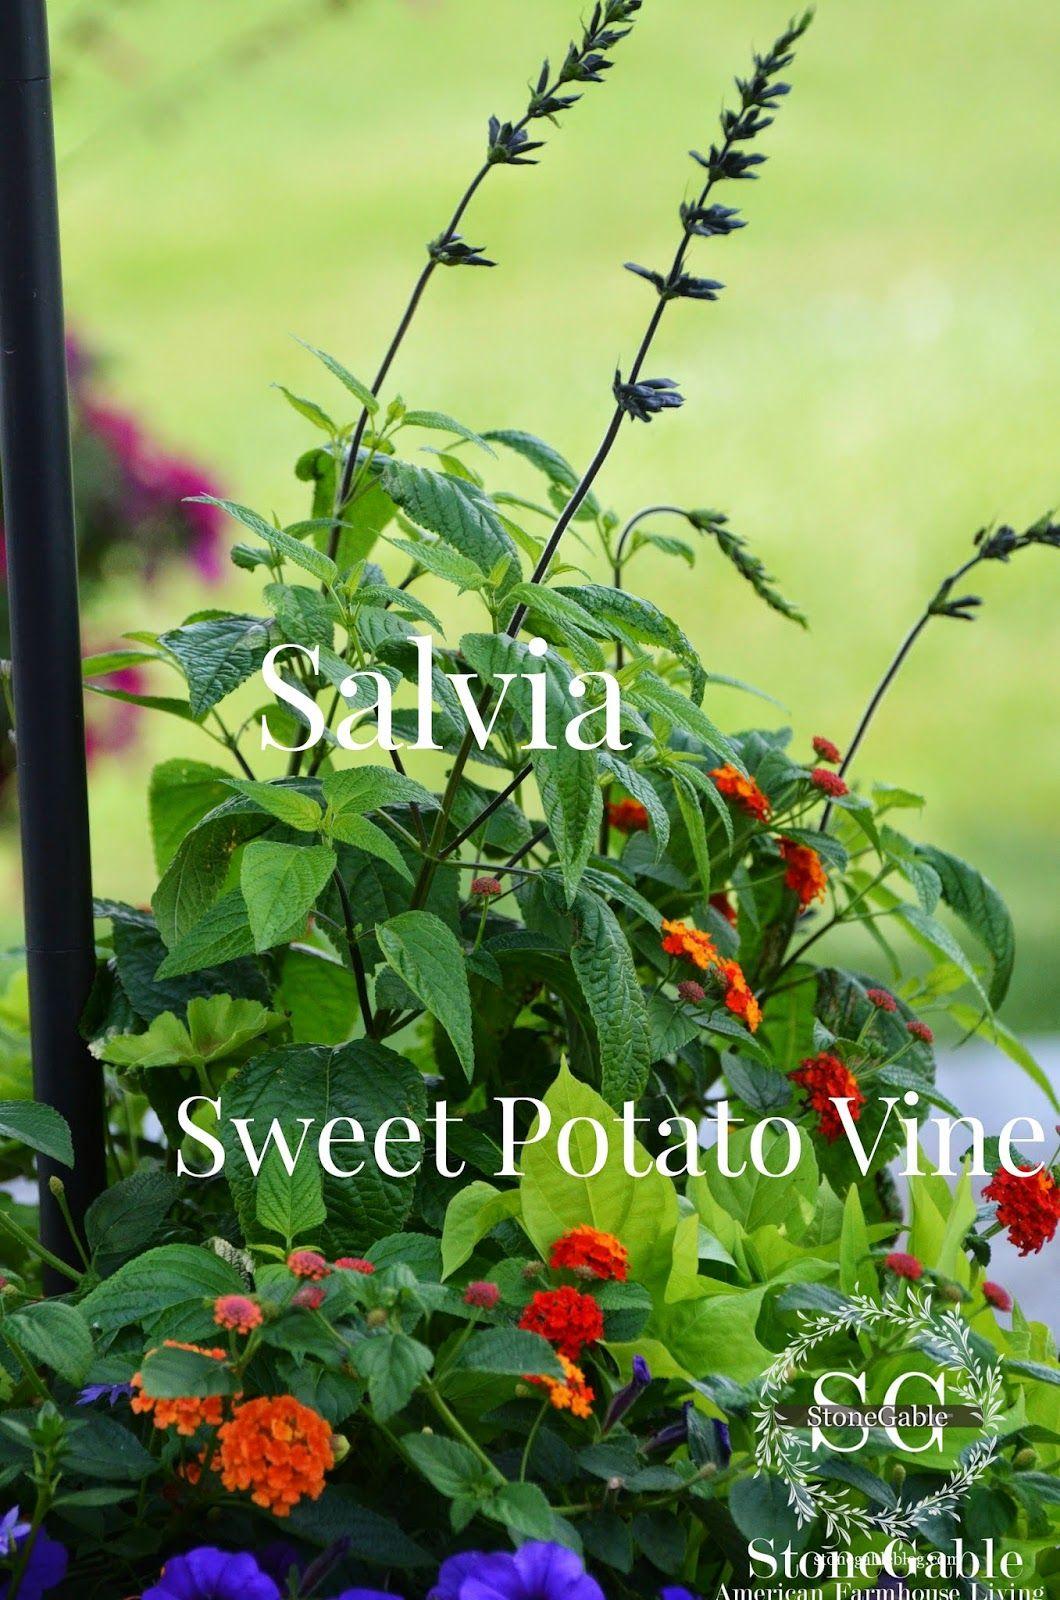 THE ANATOMY OF A FLOWER POT | Pinterest | Anatomy, Flower and Gardens